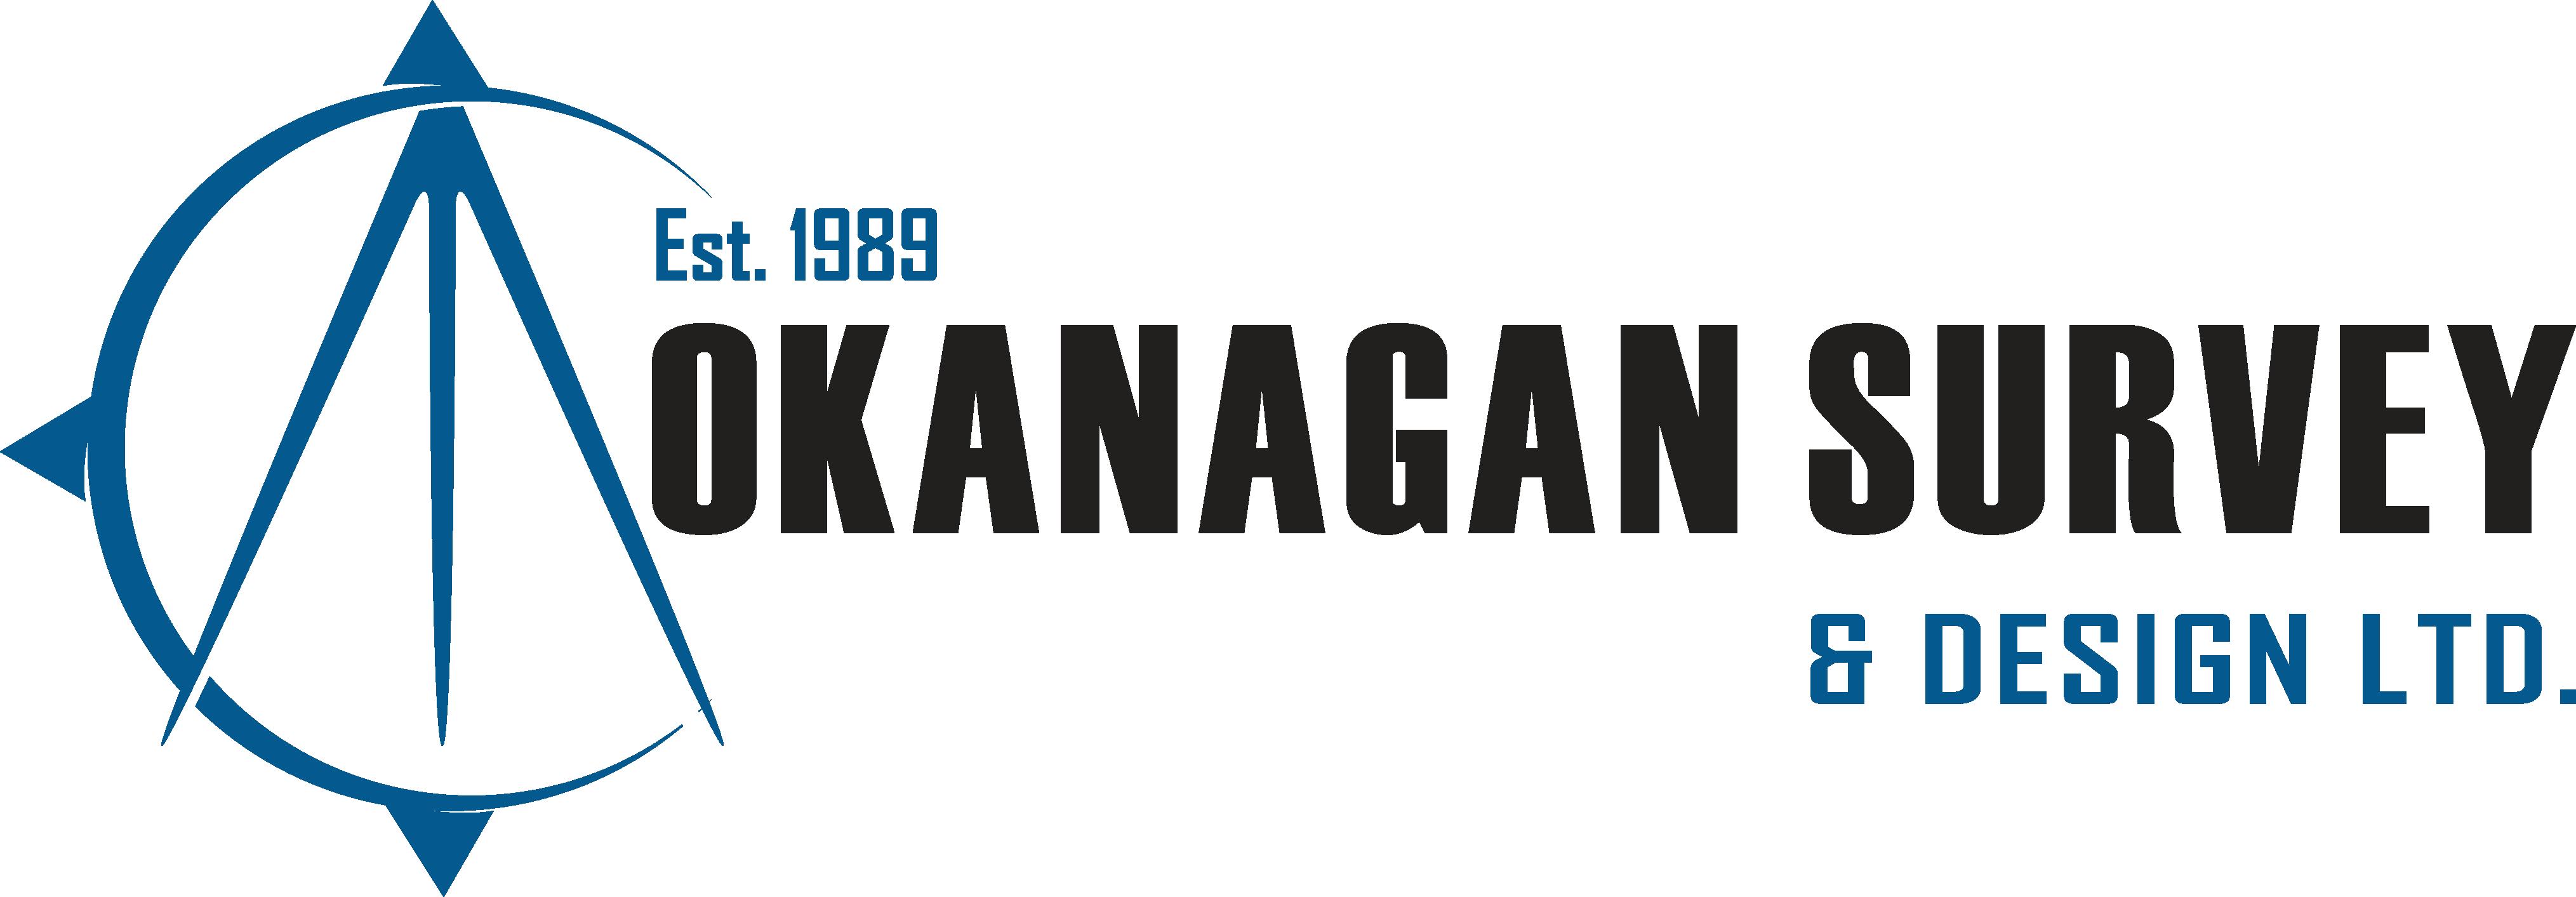 Okanagan Survey & Design